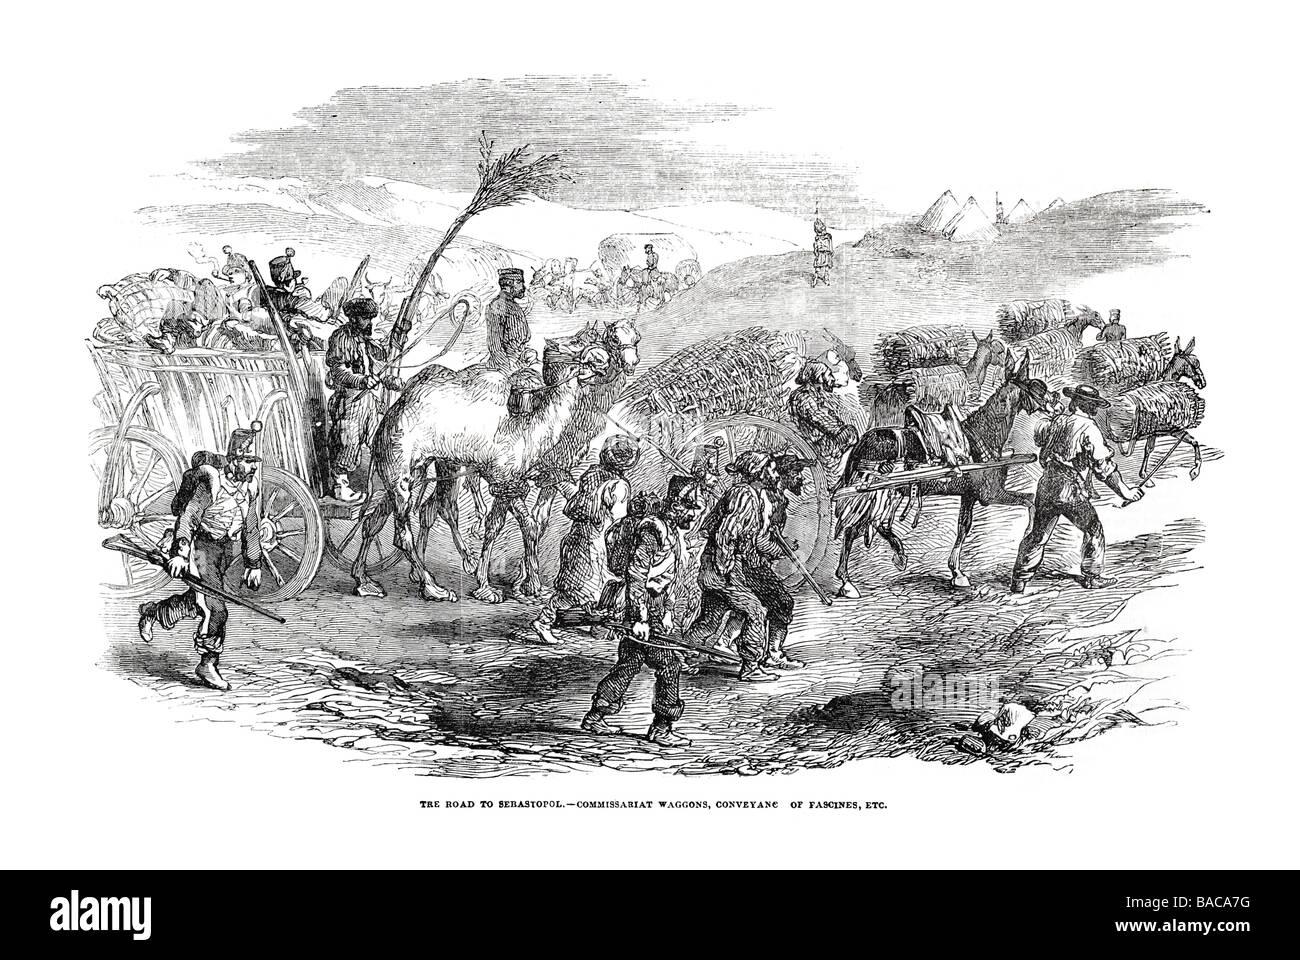 road to sebastopol commissariat waggons conveyanc of fascines 1854 - Stock Image